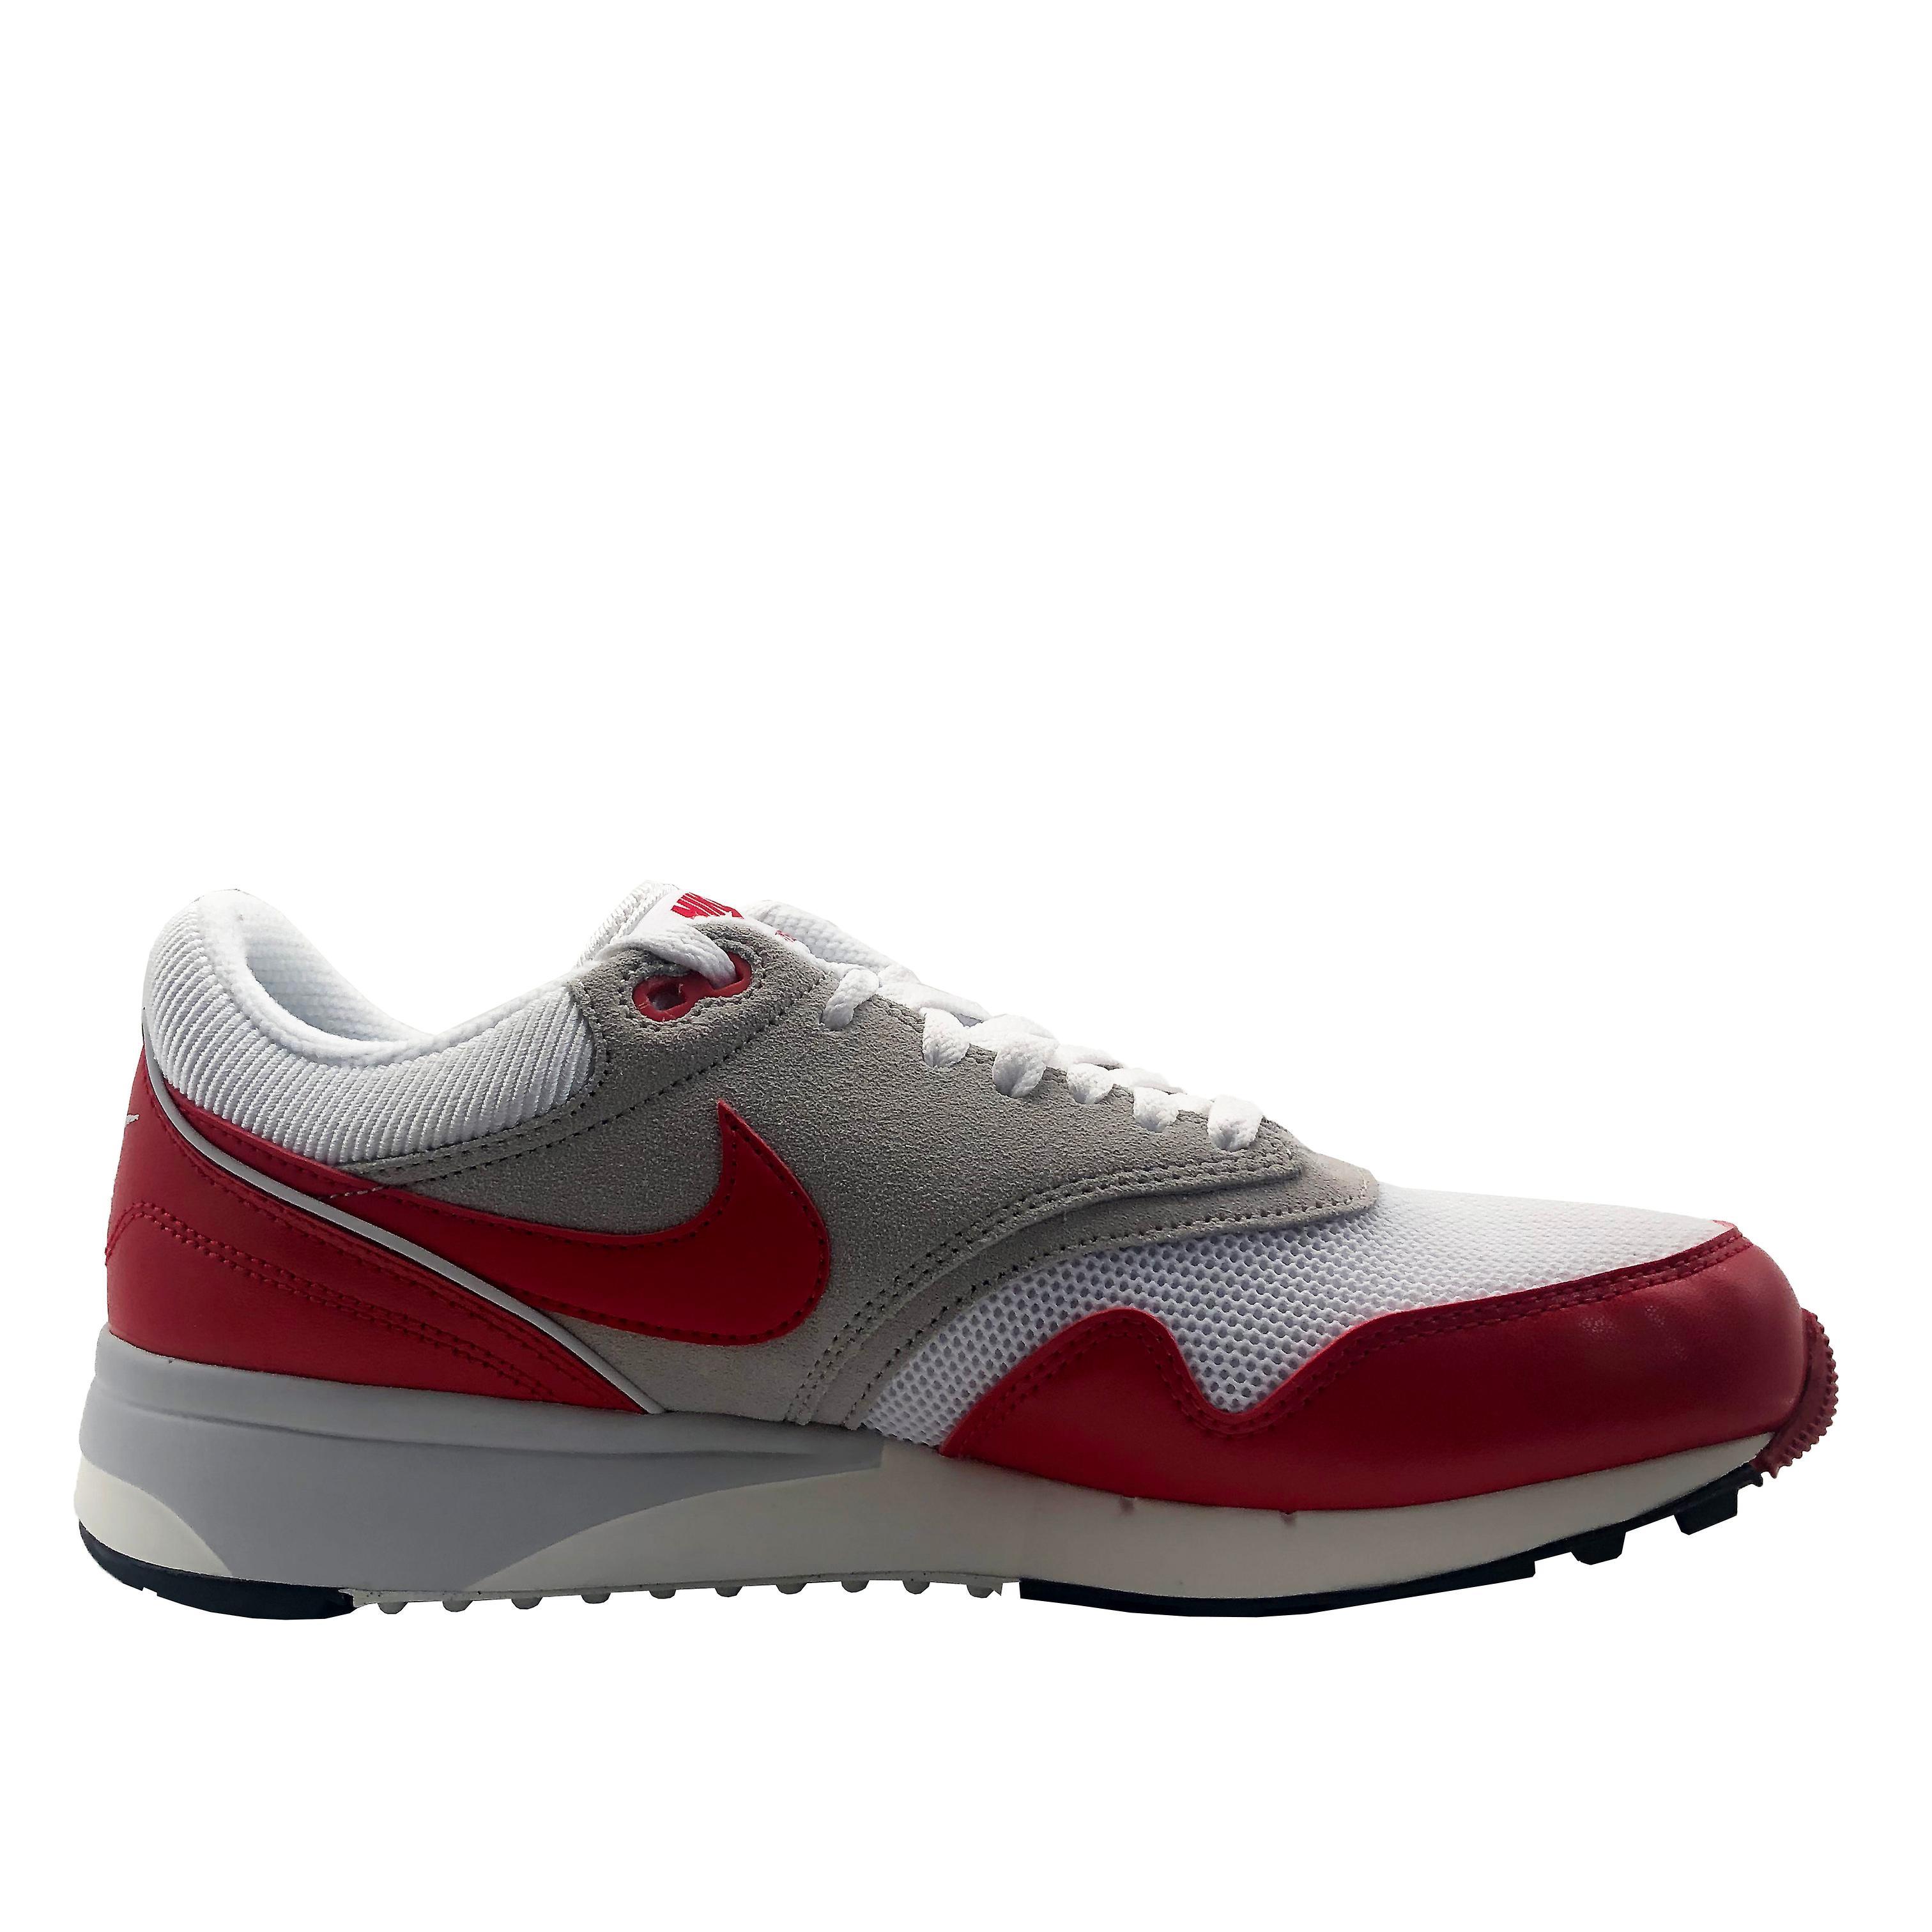 Nike Air Odyssey 652989 106 Herren Trainer